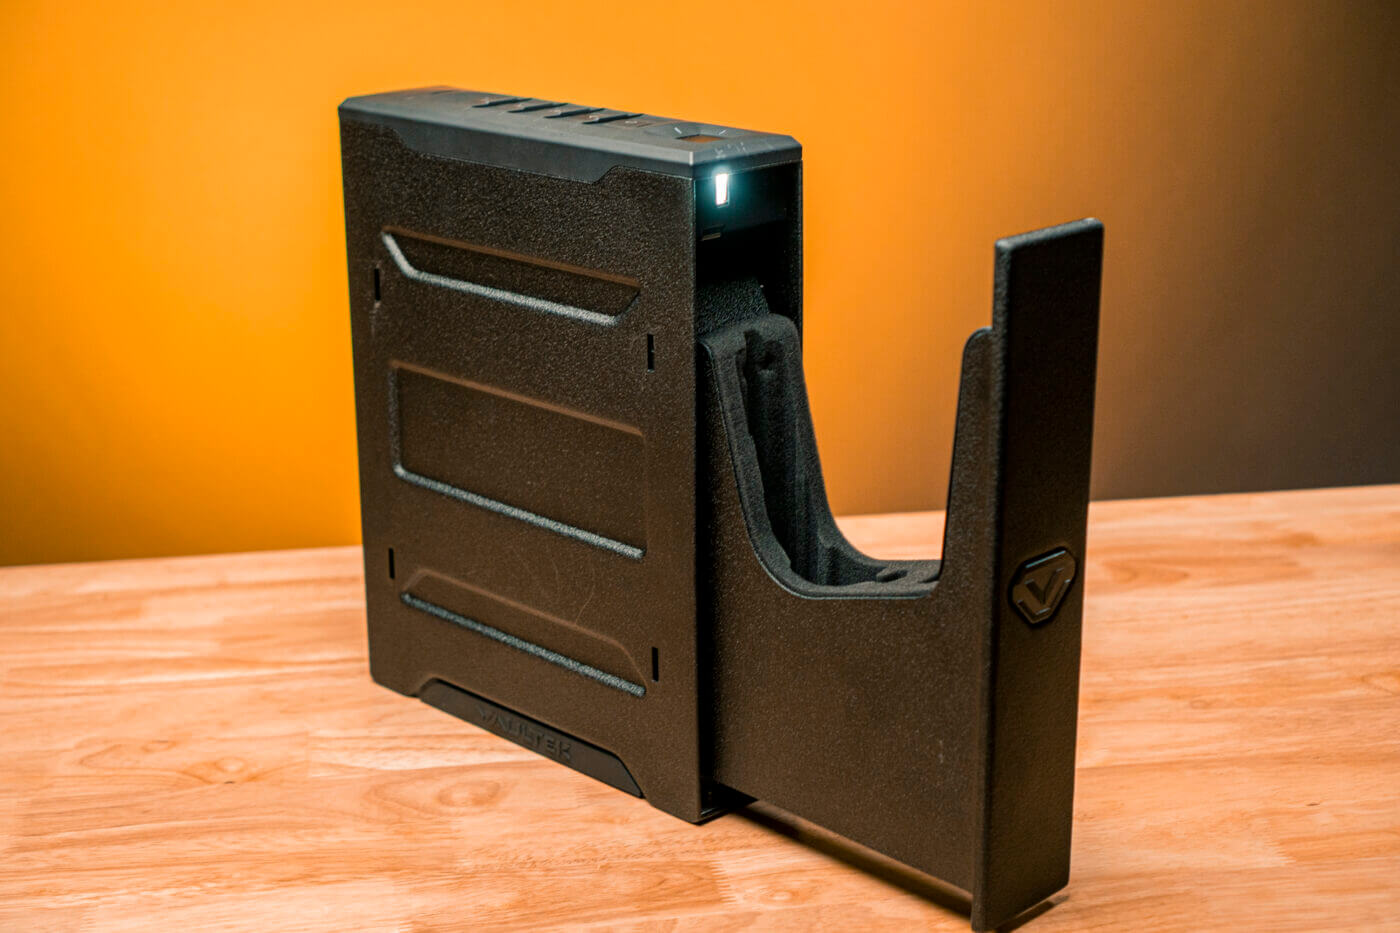 Vaultek Slider Series gun safe